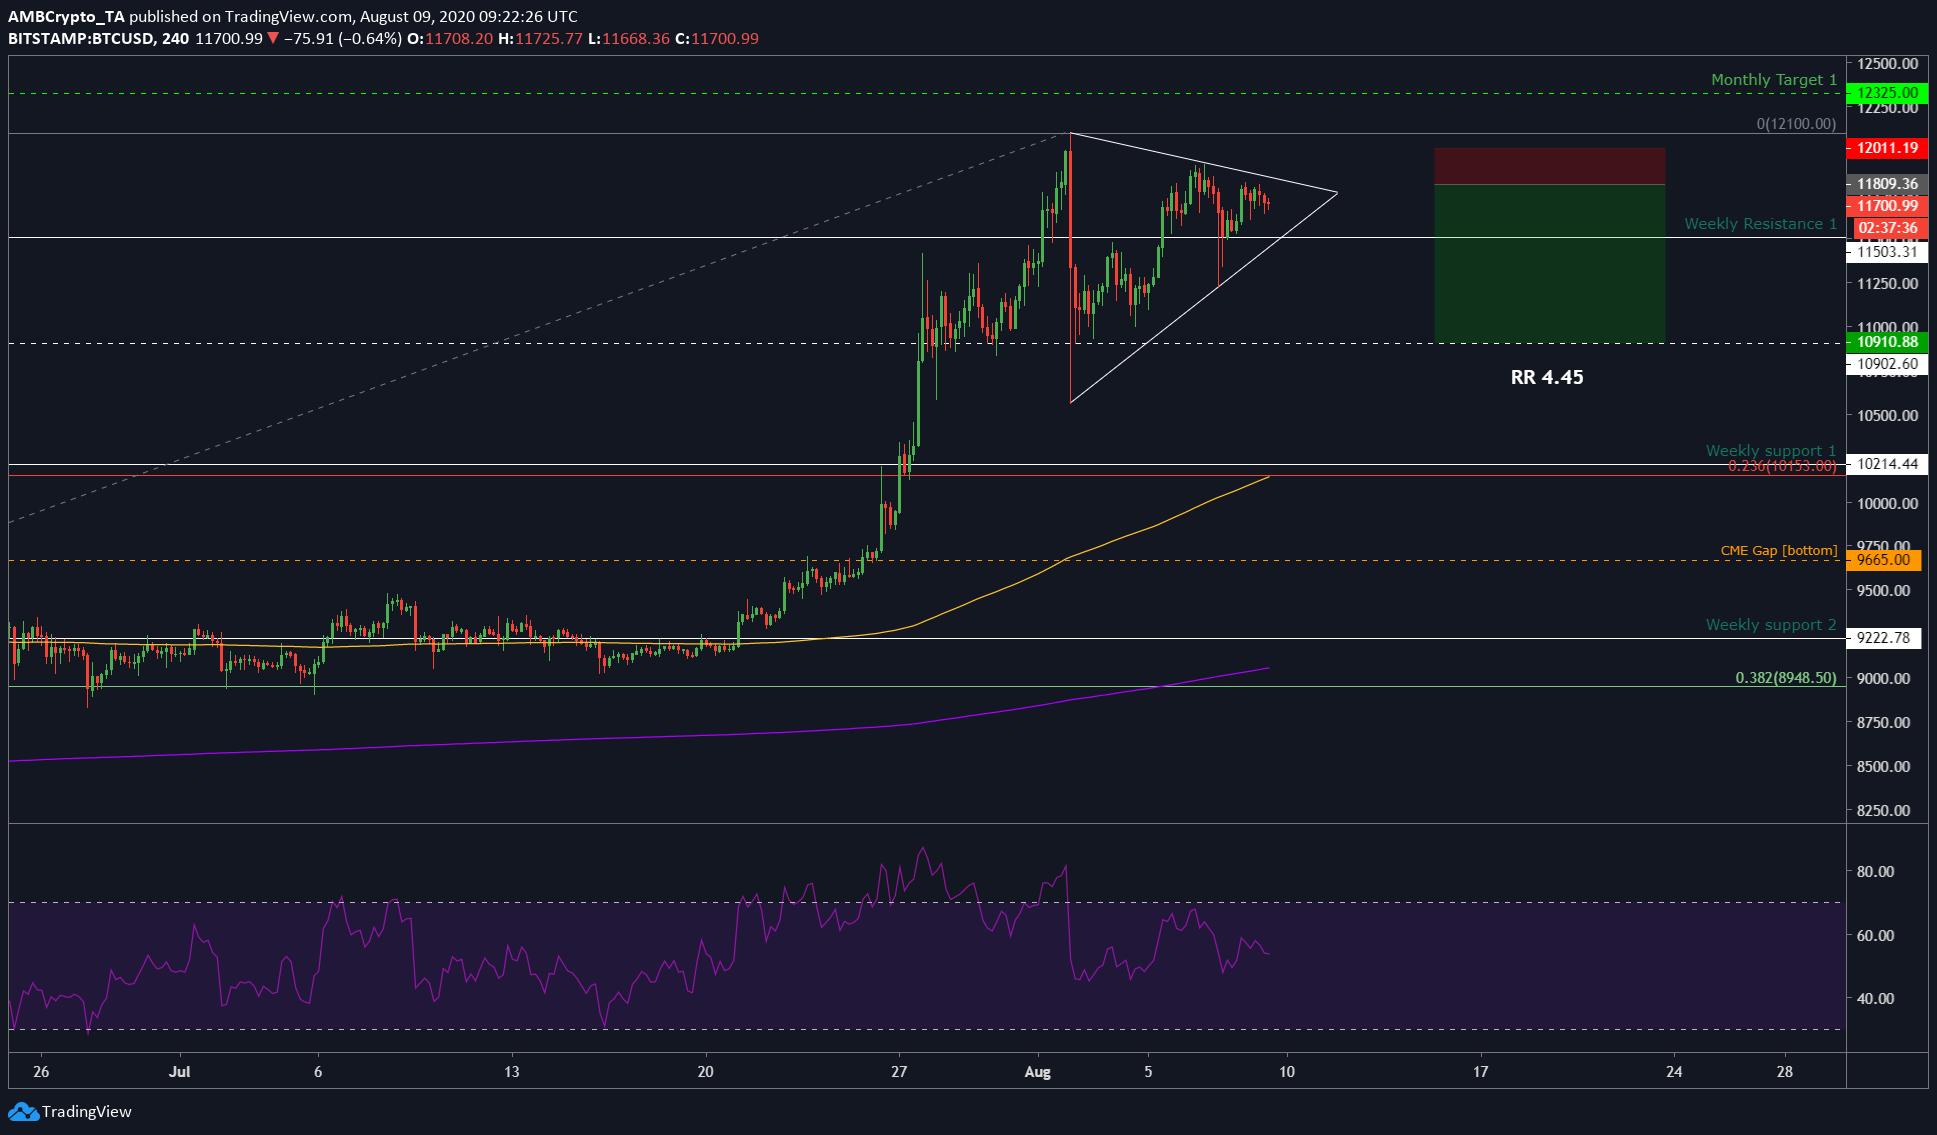 Bitcoin short-term price analysis: 09 August